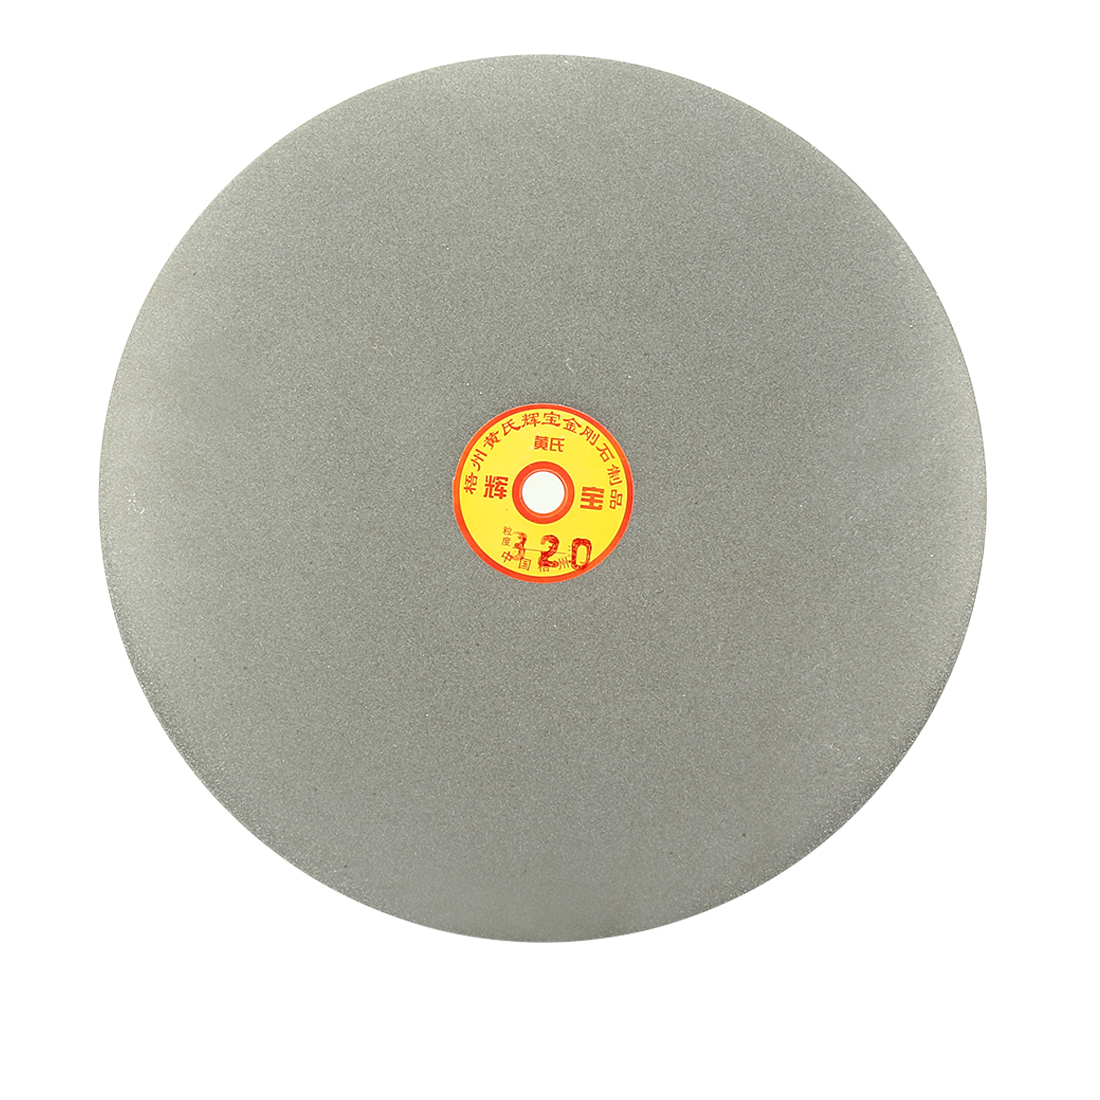 250mm 10-inch Grit 320 Diamond Coated Flat Lap Disk Wheel Grinding Sanding Disc